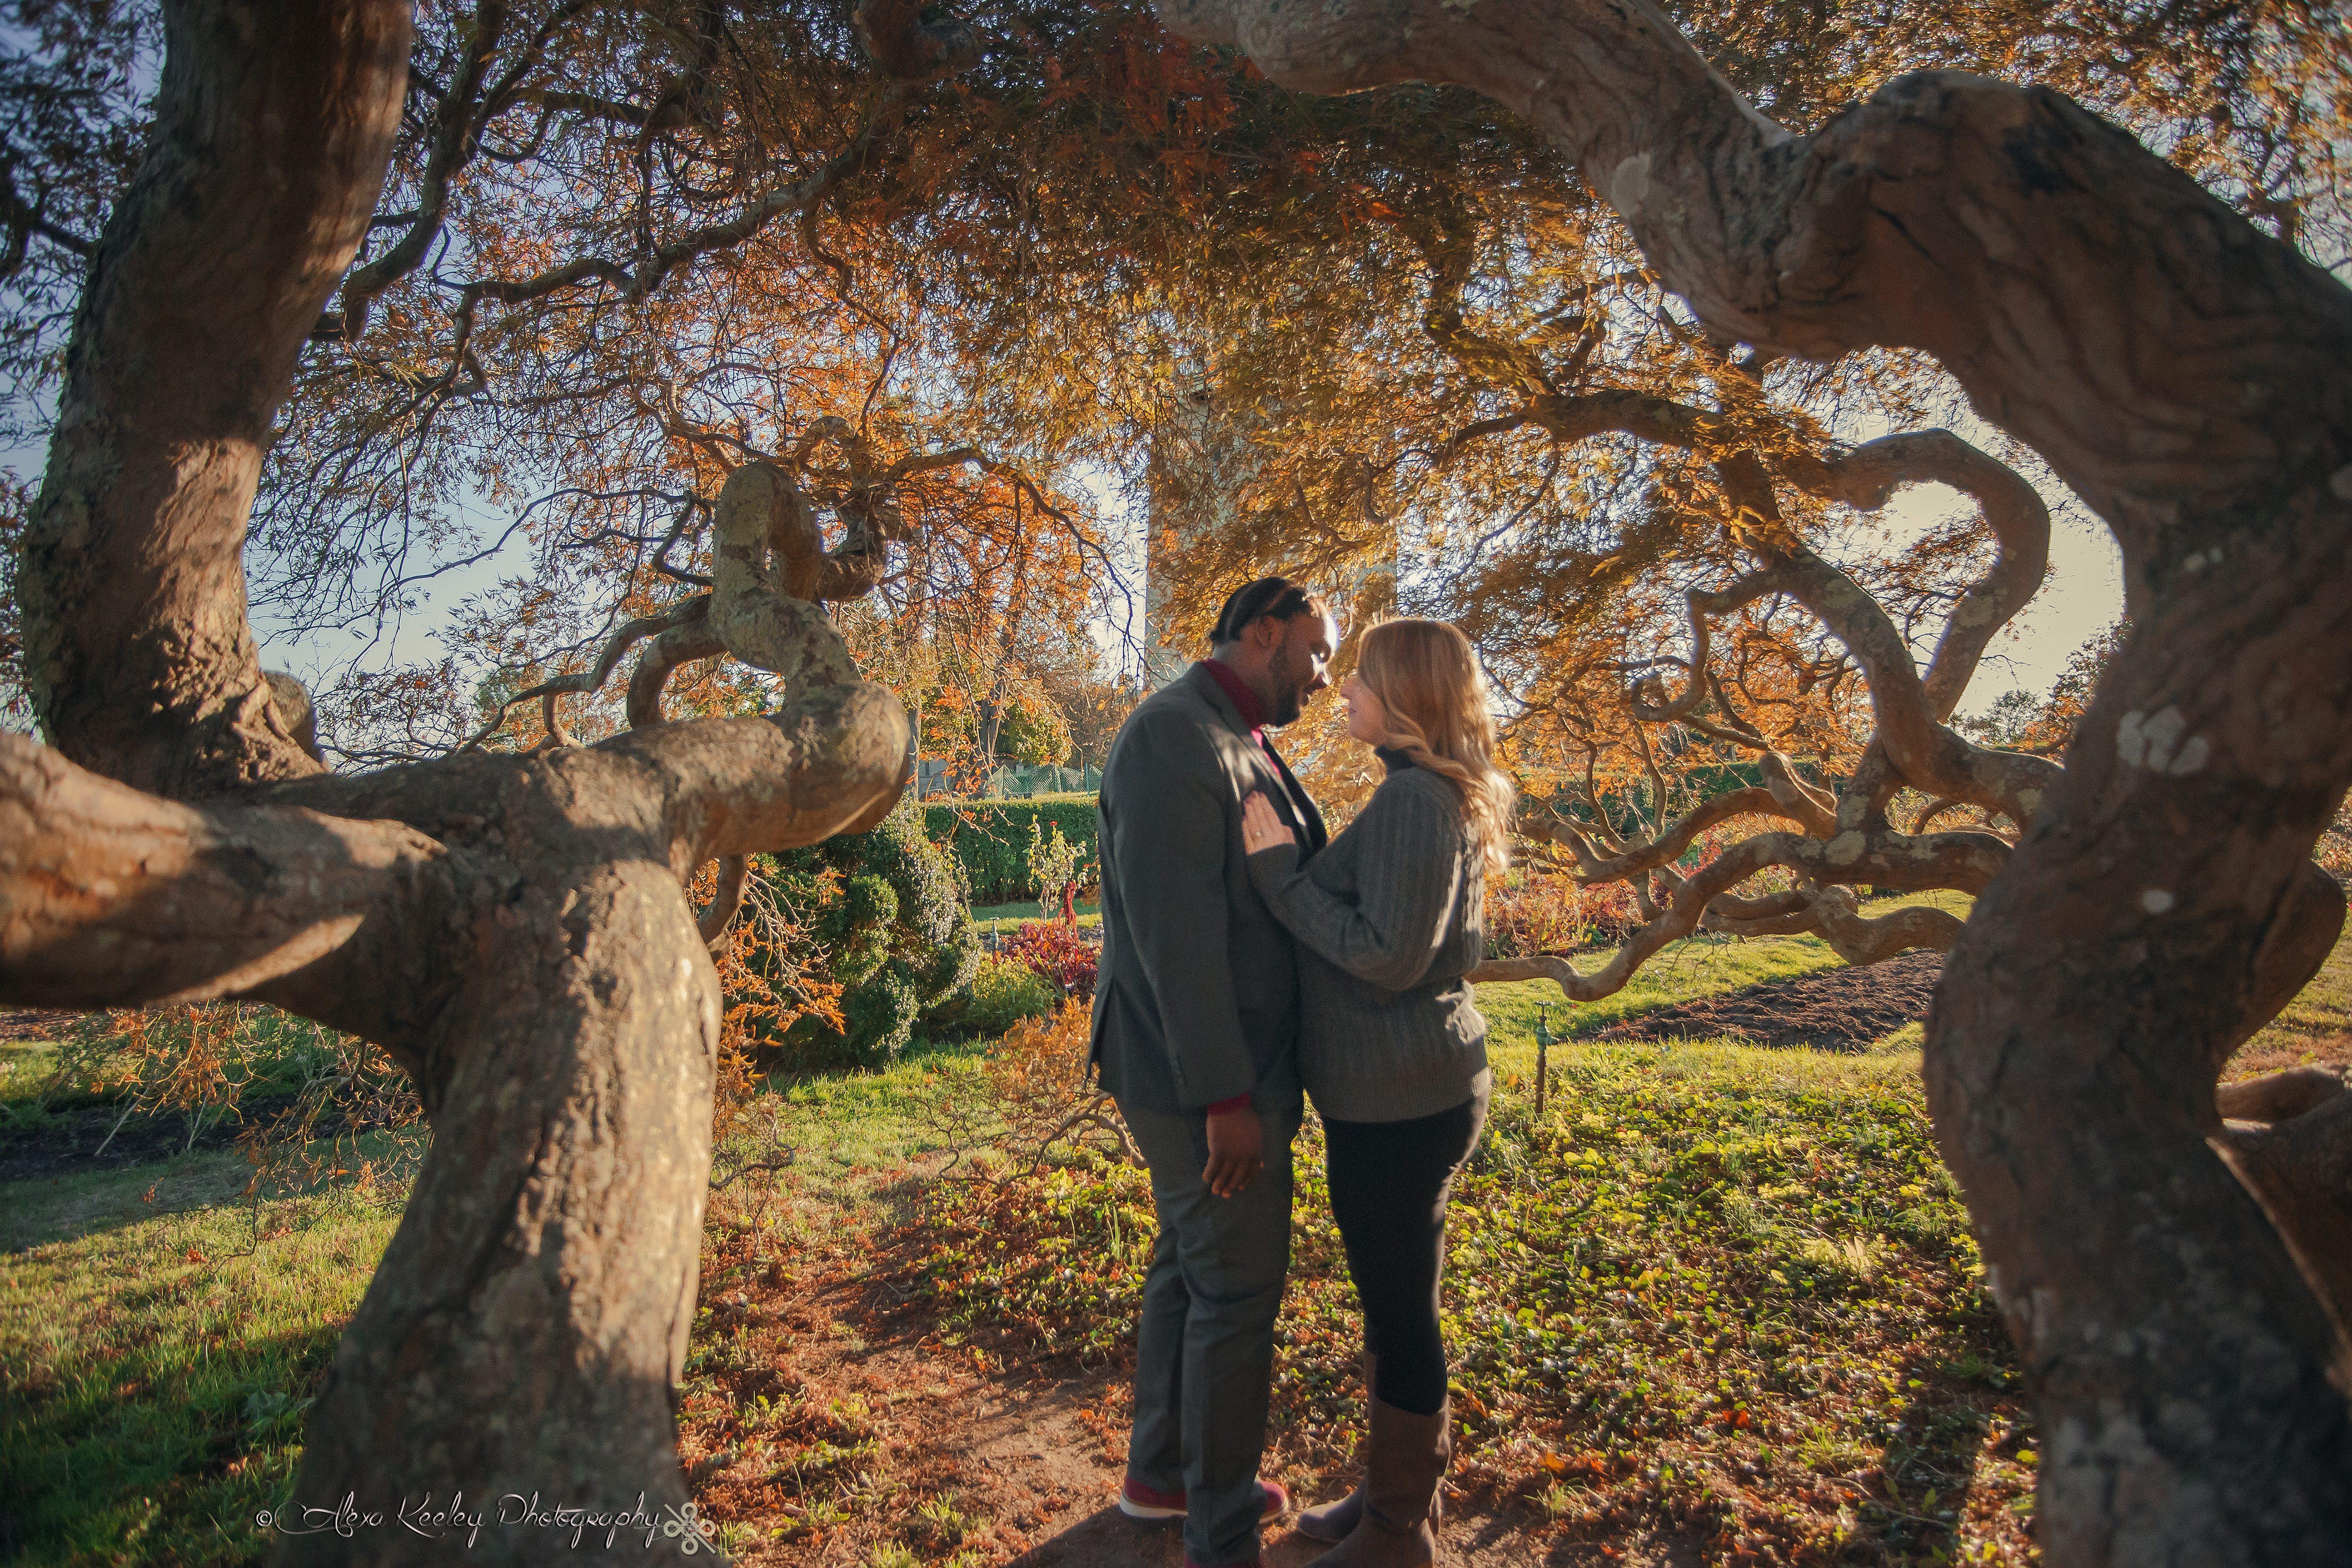 Alexa Keeley Photography